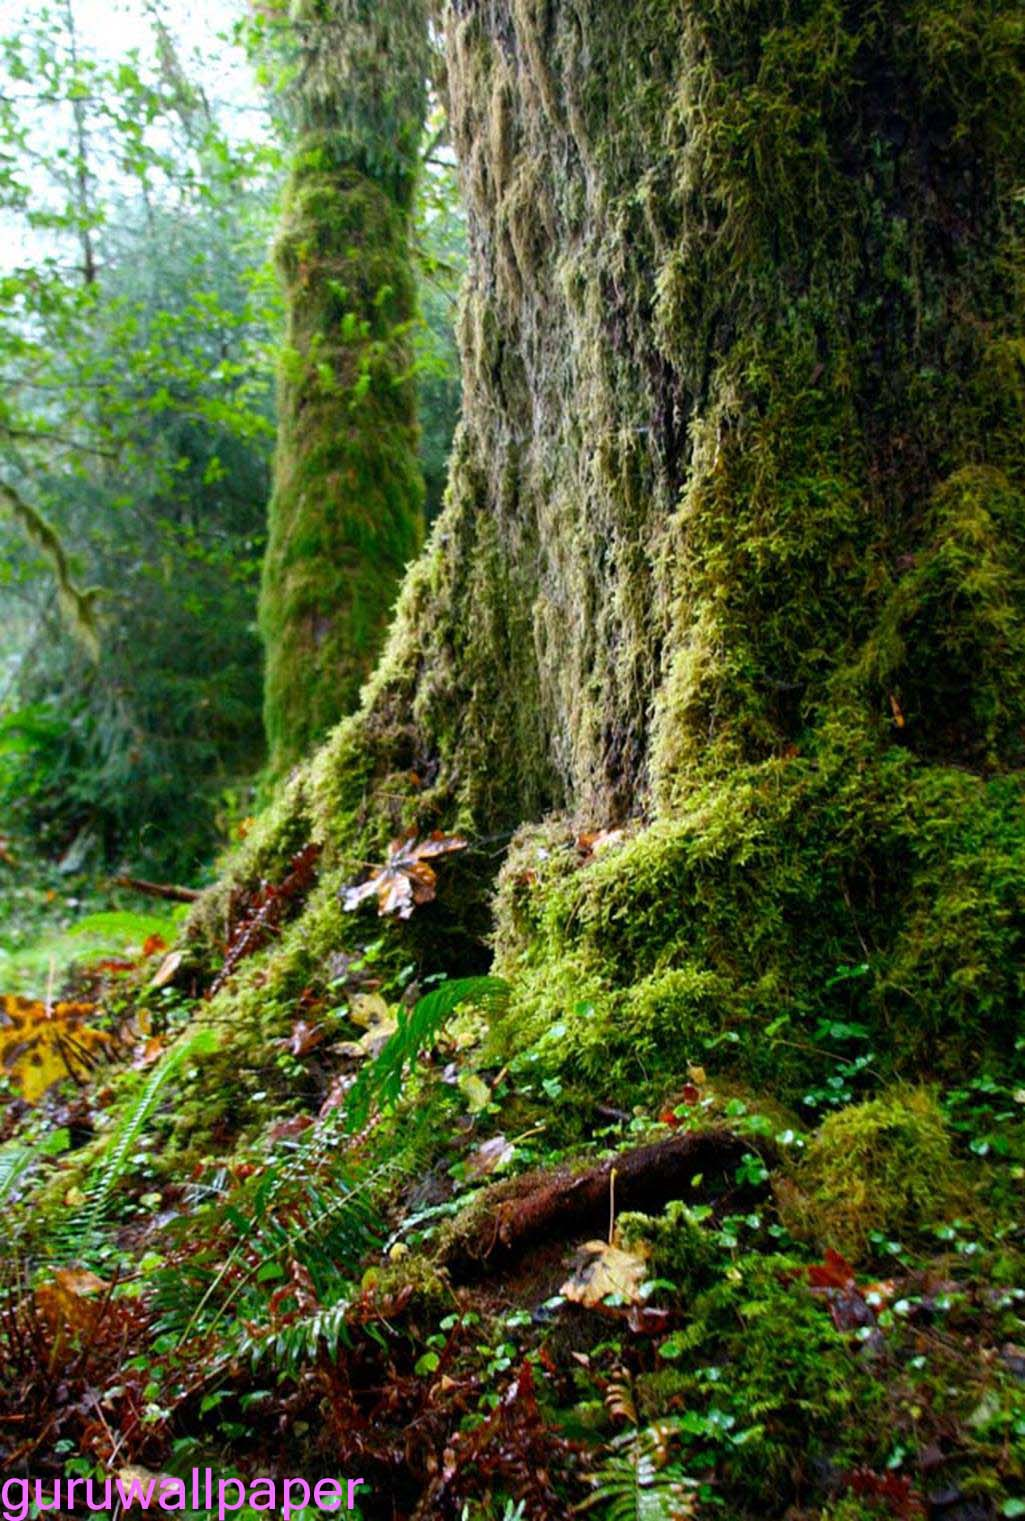 Rainy forest wallpaper wallpapersafari - Rainy nature hd wallpaper ...